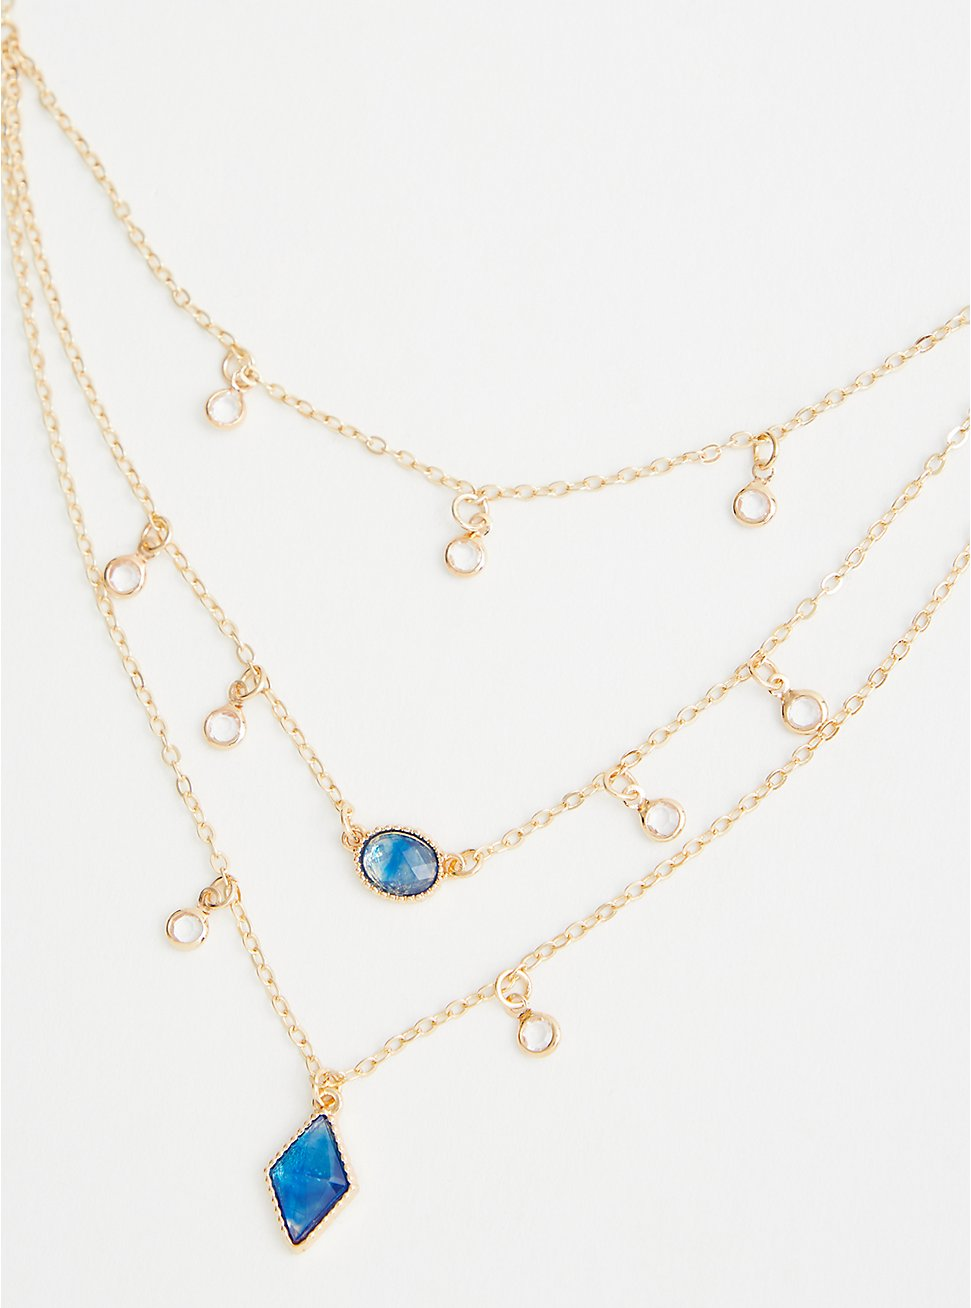 Ocean Blue Stones Layered Necklace - Gold Tone, , hi-res